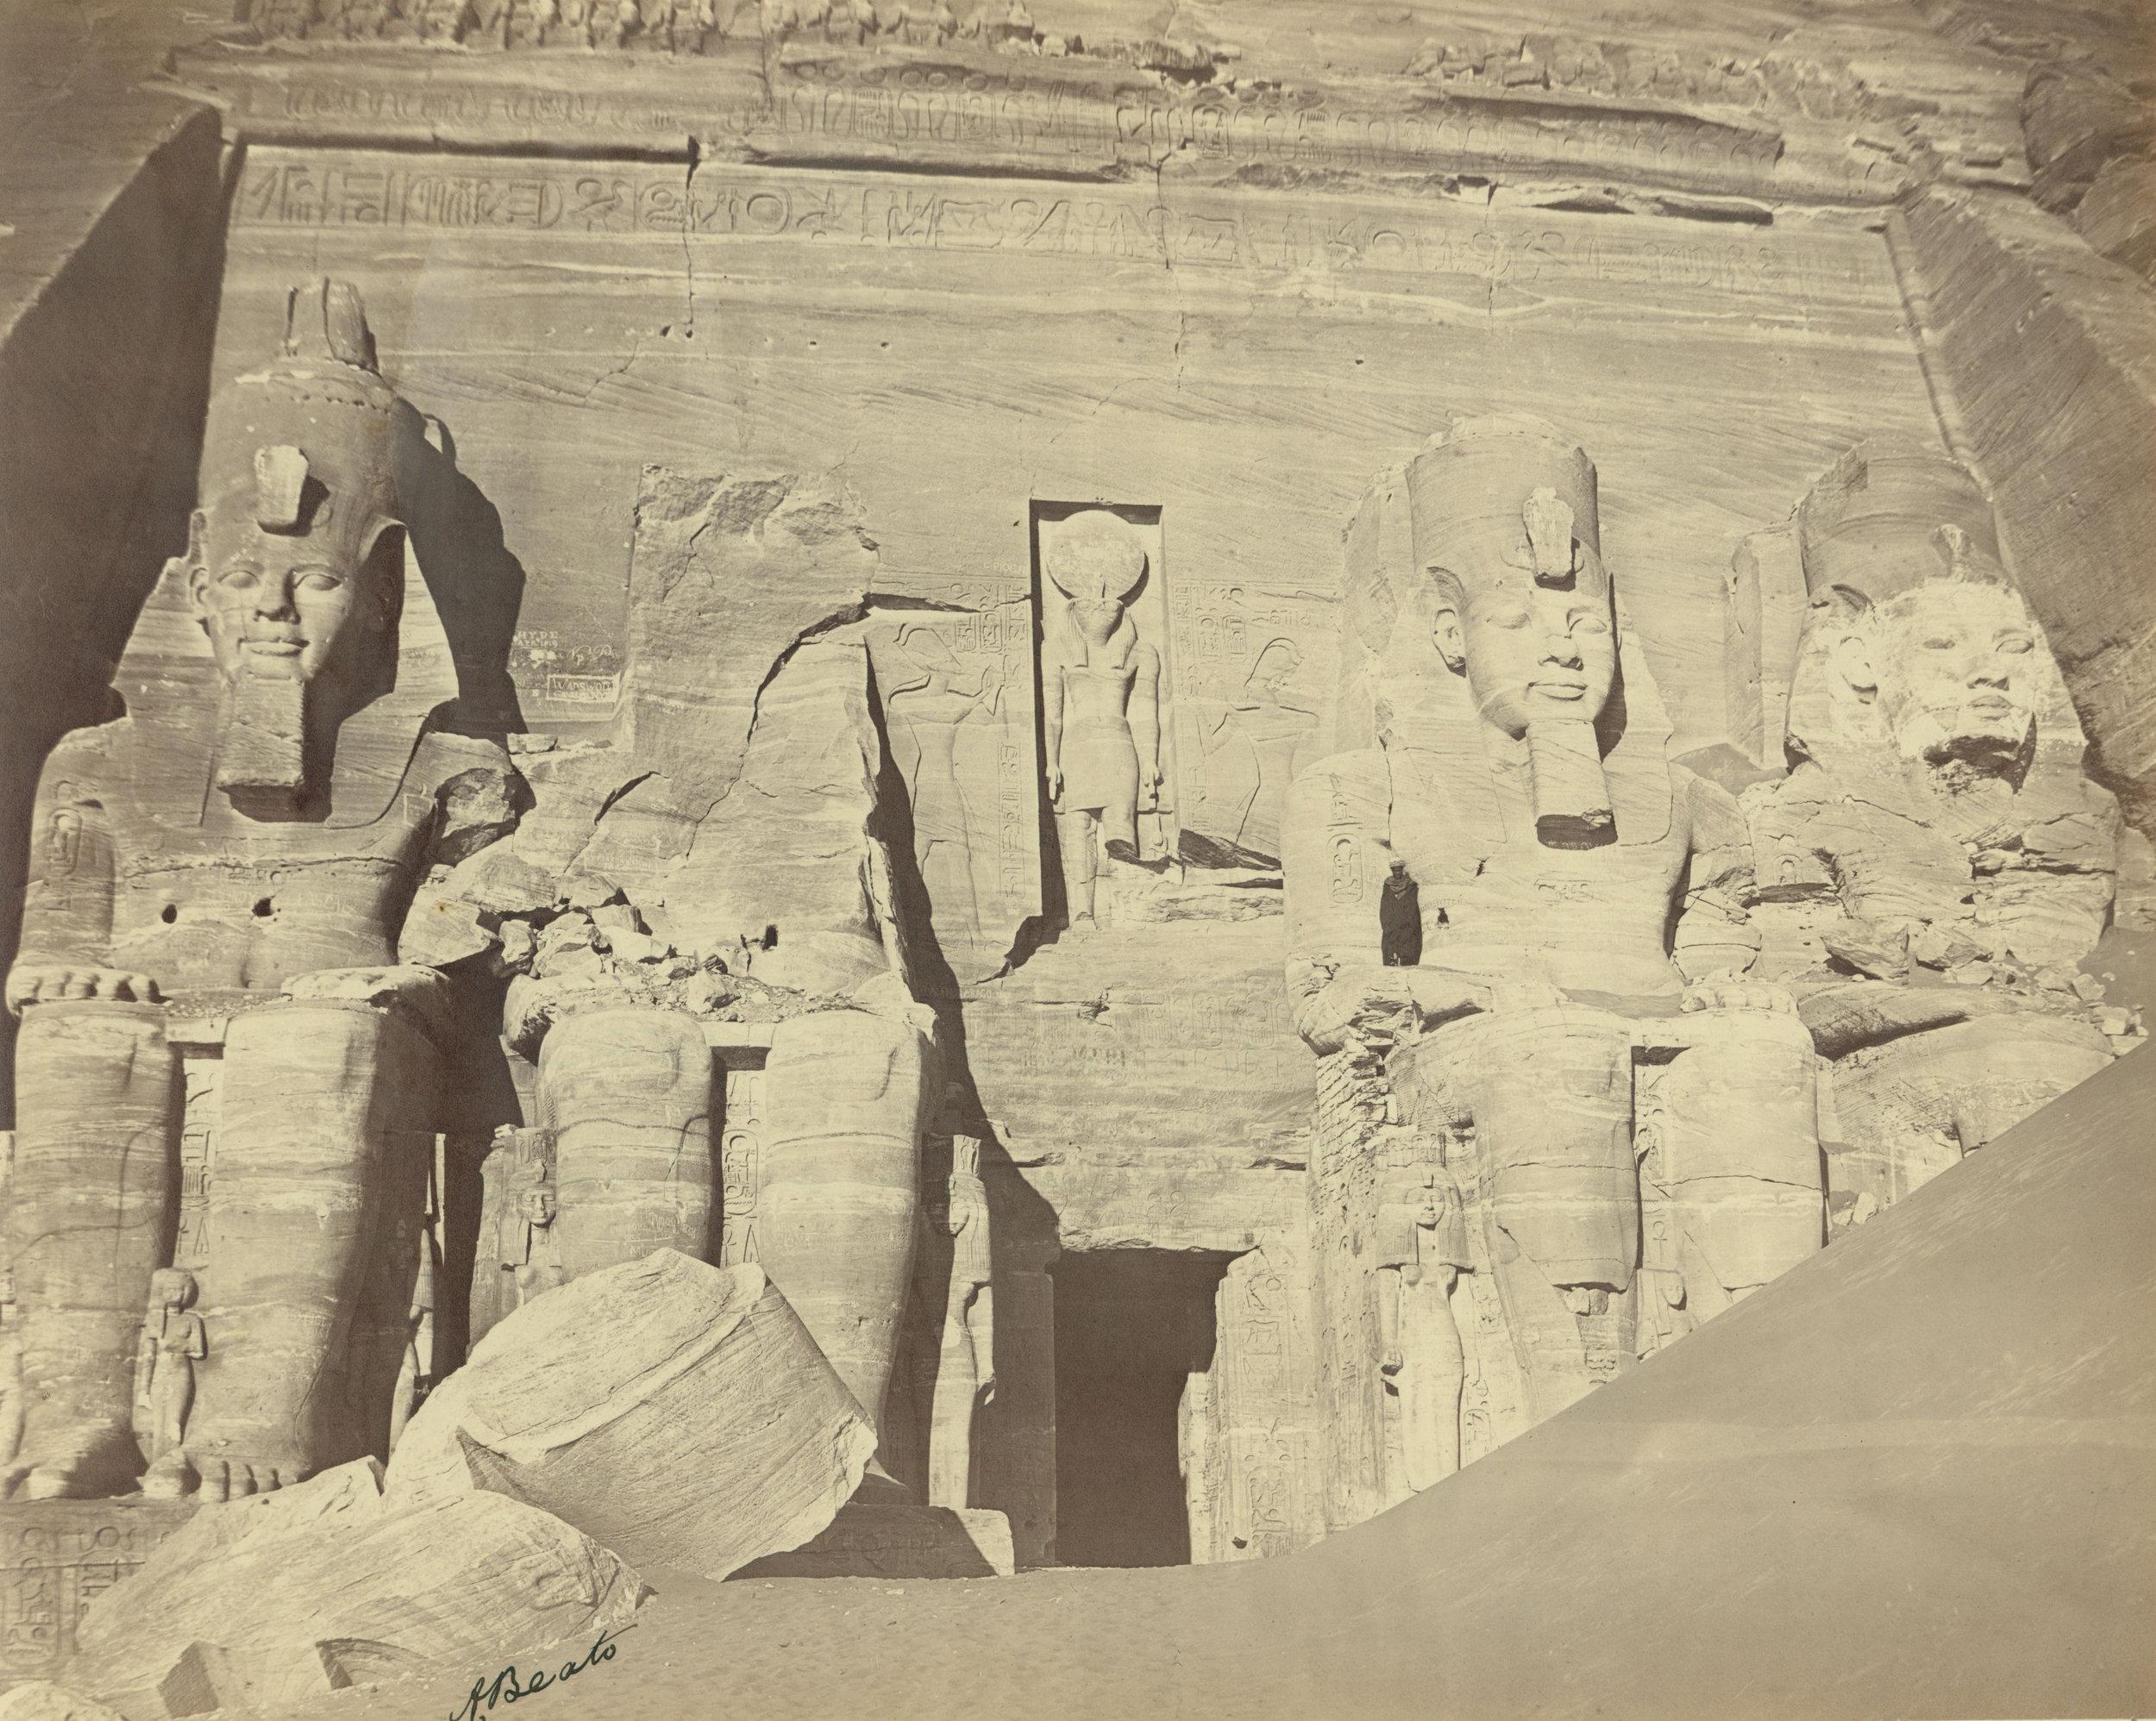 ANTONIO BEATO,  Abu Simbel (Façade), Egypt , c. 1887